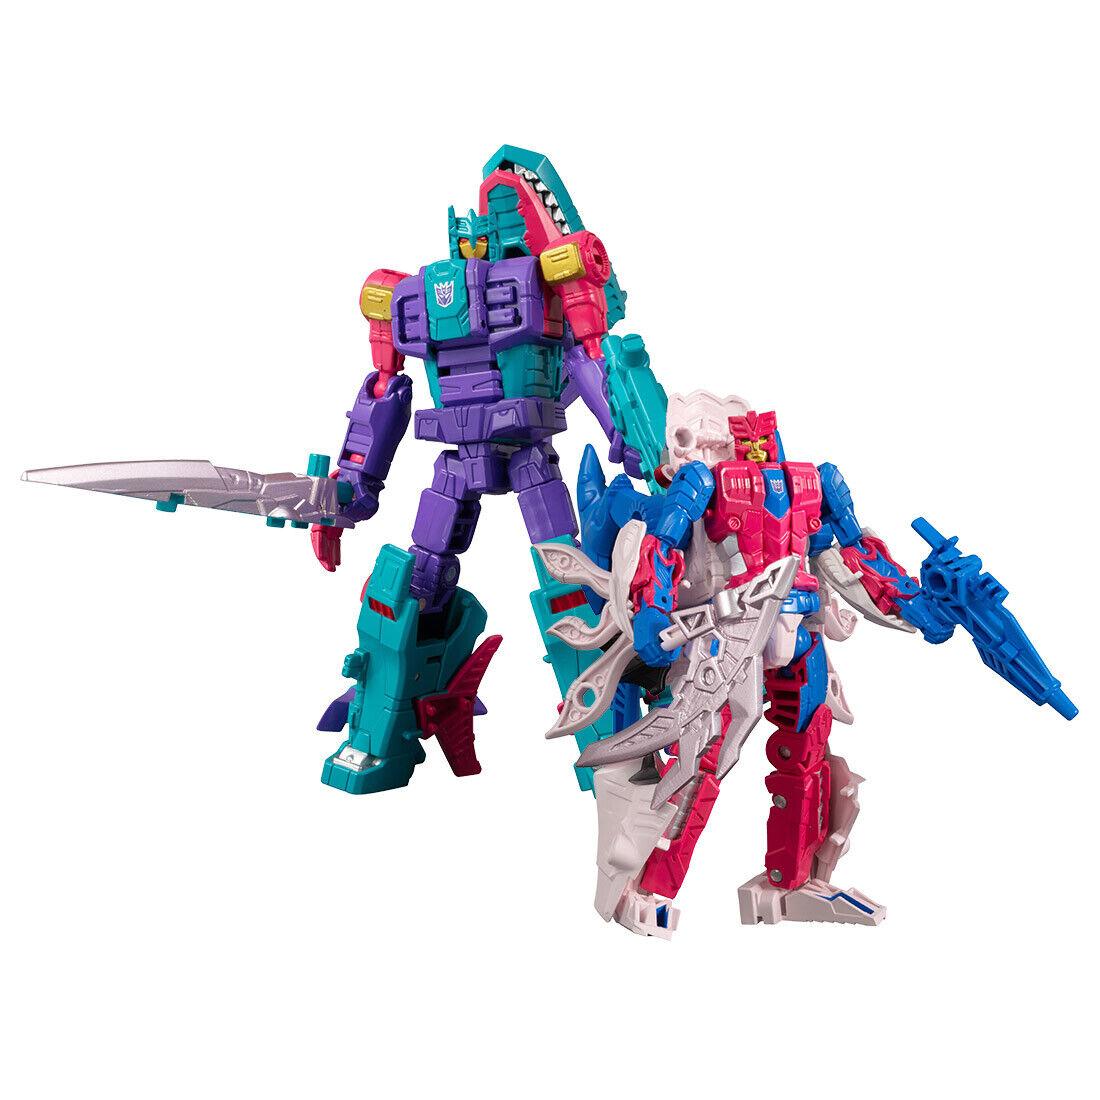 Transformers GENERATION SELECTS King Poseidon Wave3 set (Overbite + Tentakil)